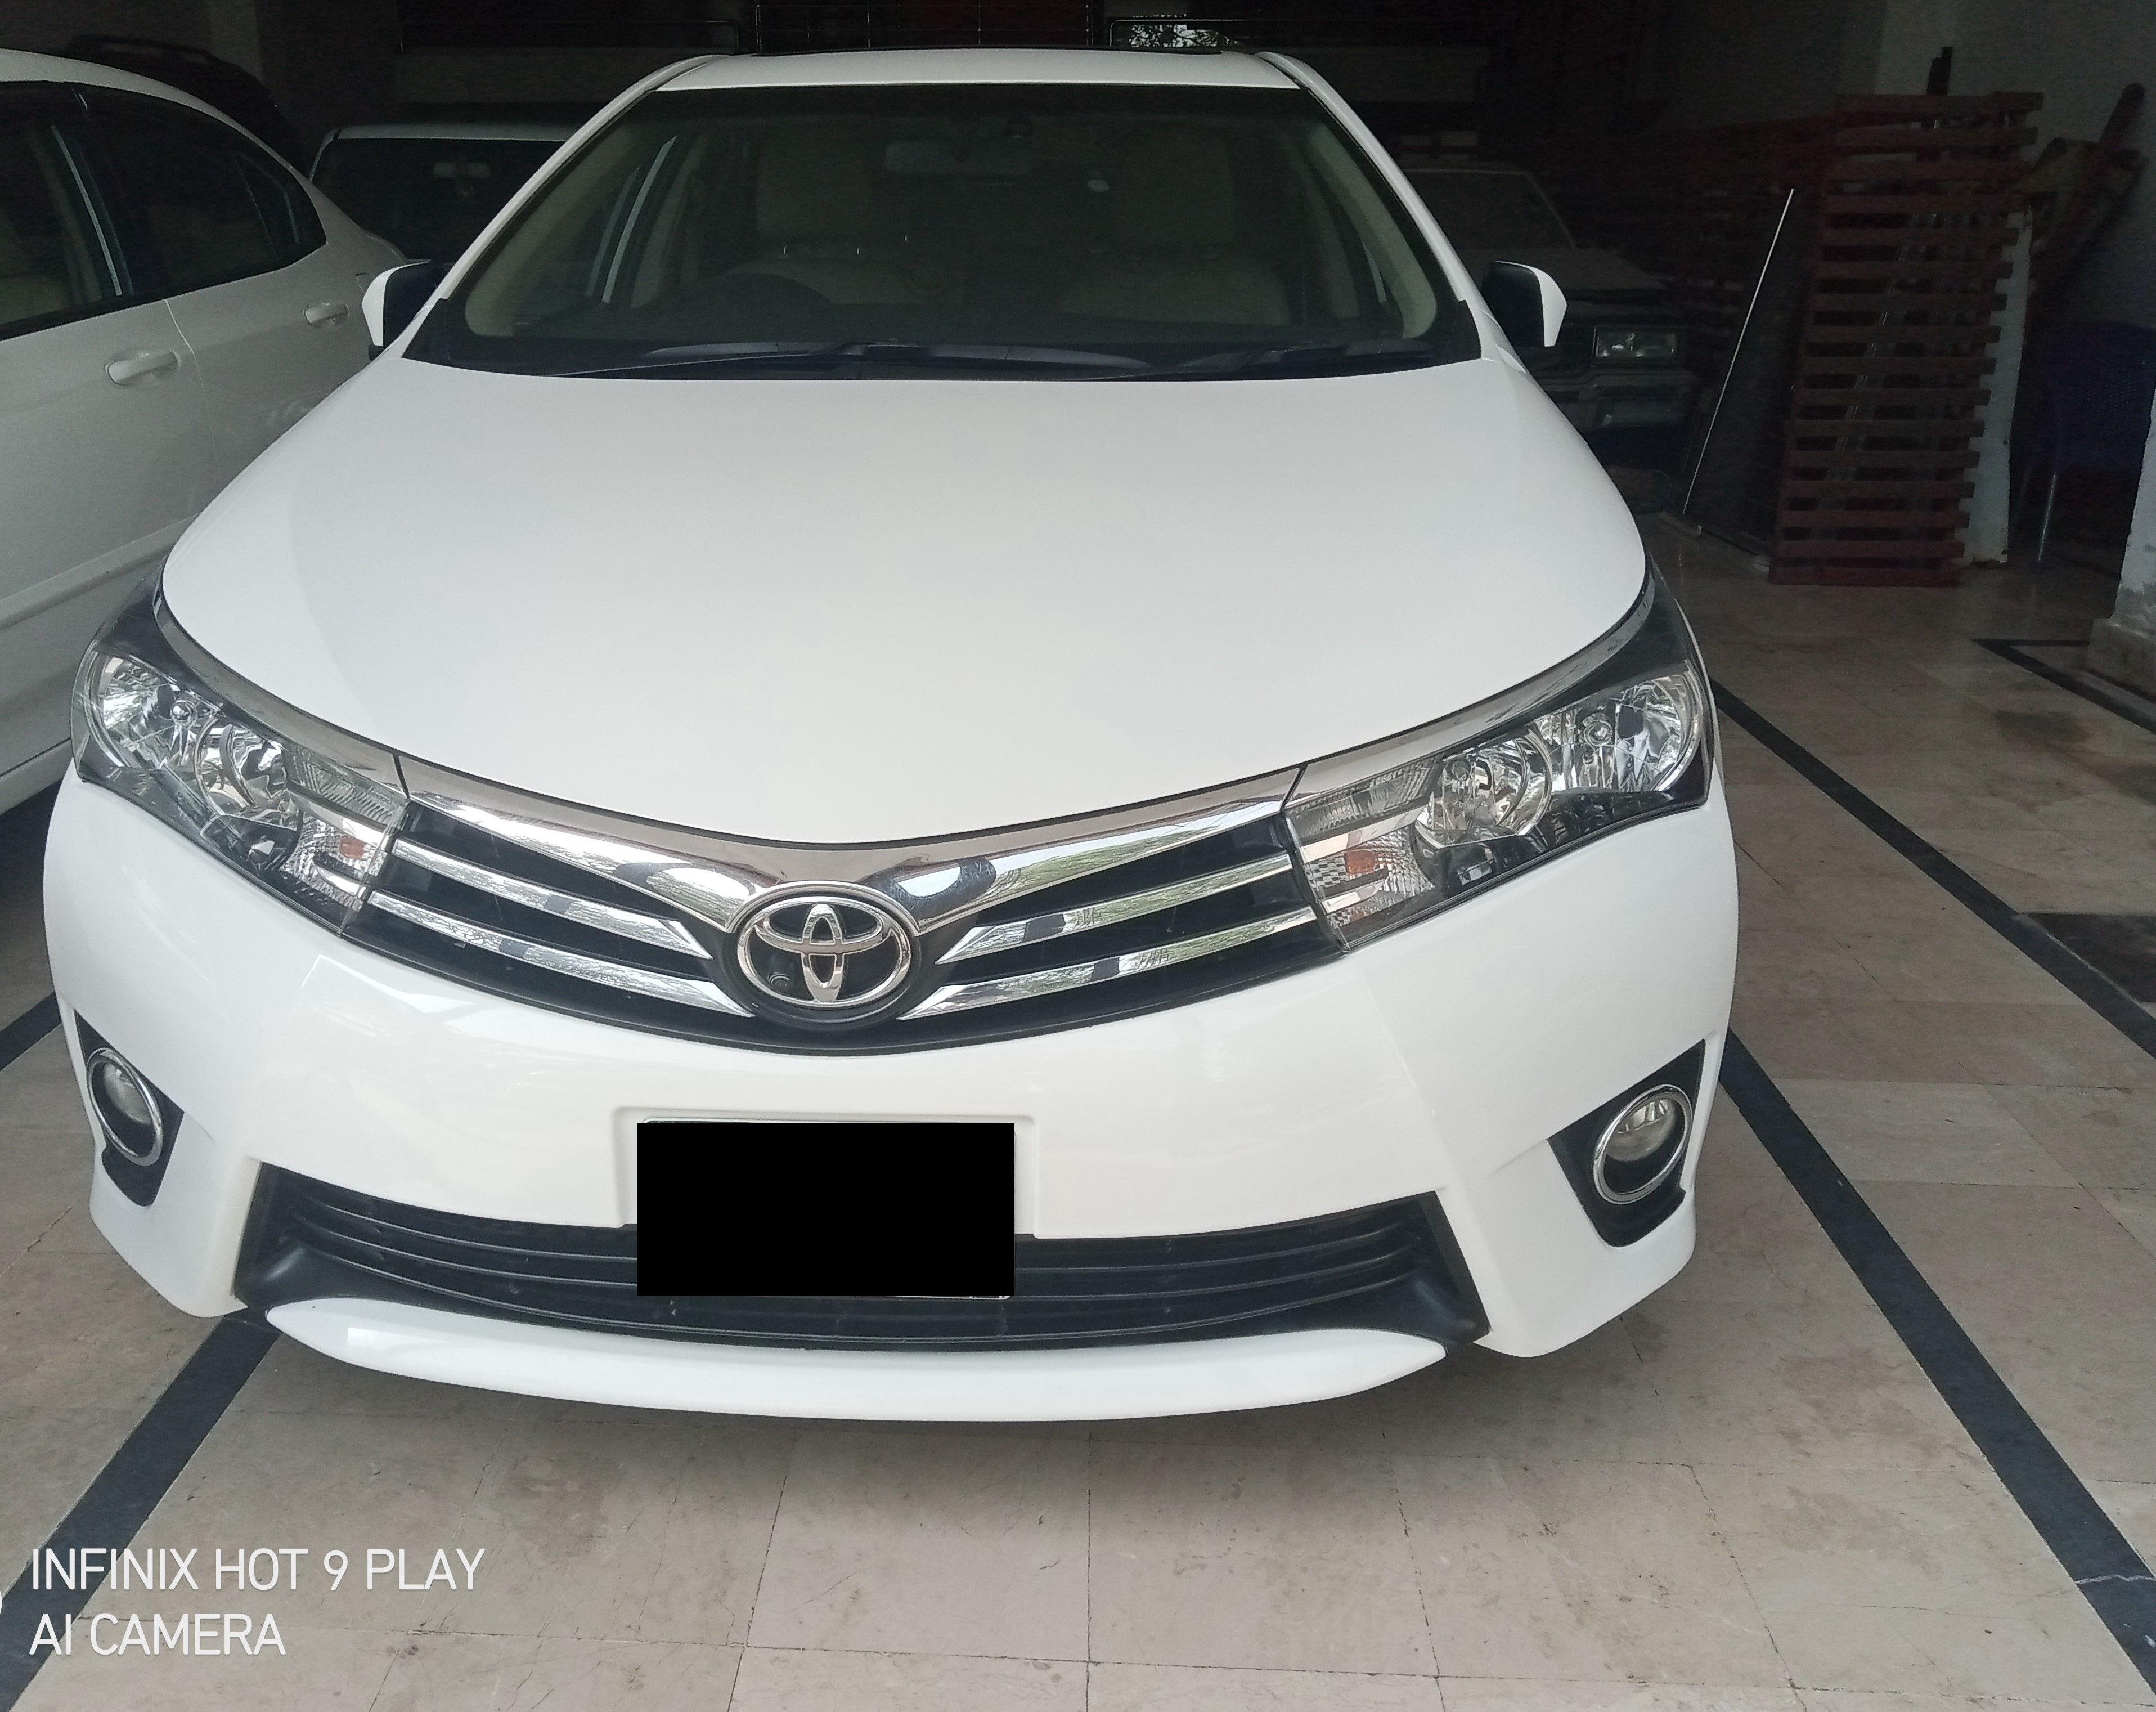 Toyota Corolla Altis Grande CVT-i 1.8 2017